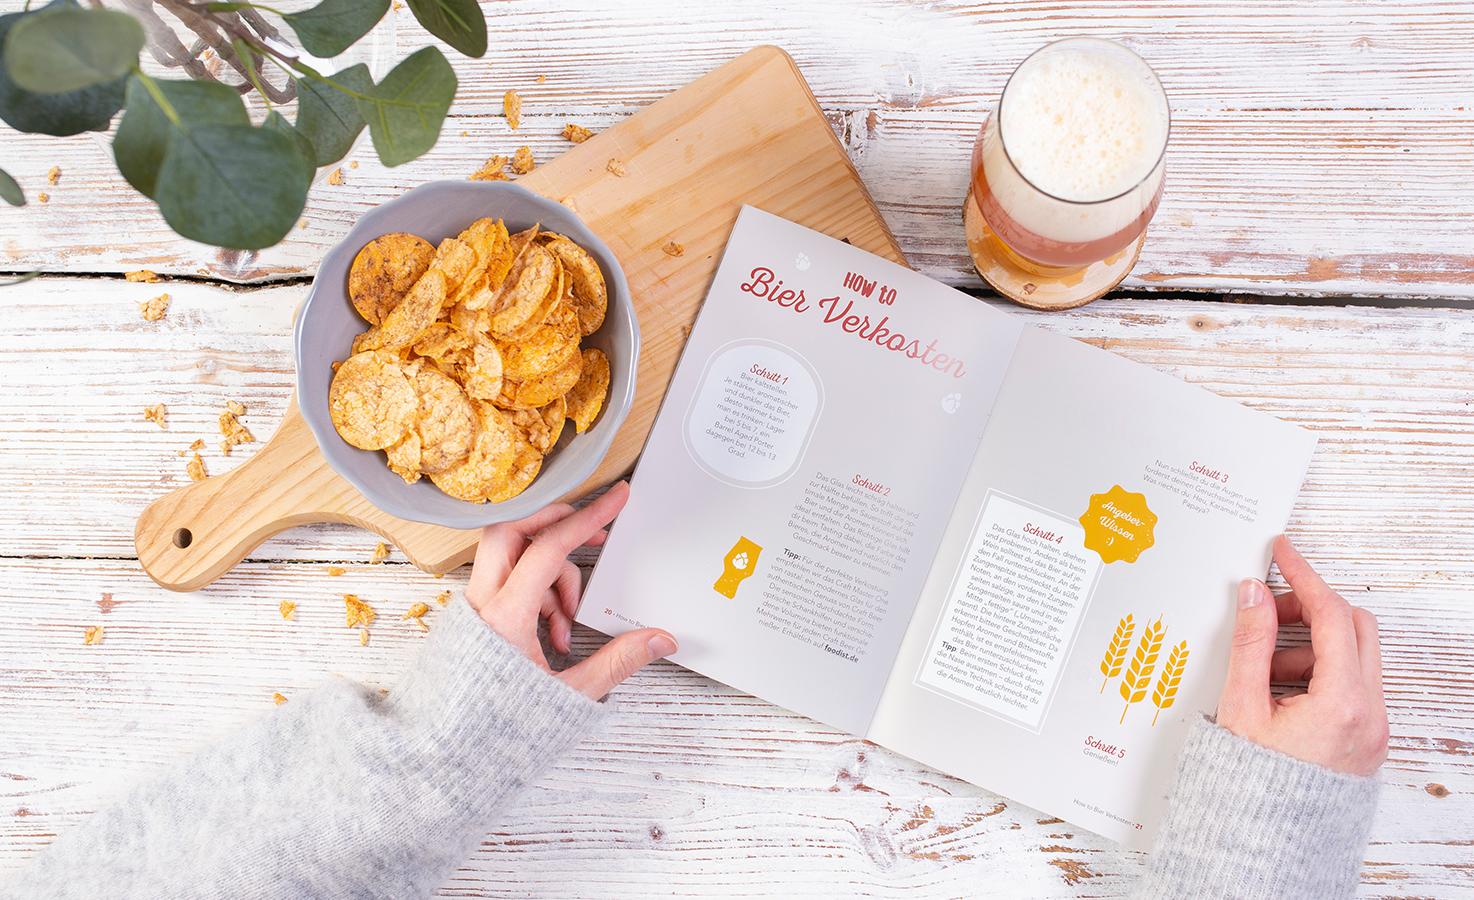 201912_Moodbild_Magazin_Foodist-10-12-20190858yQ1ChpUAYlmHm